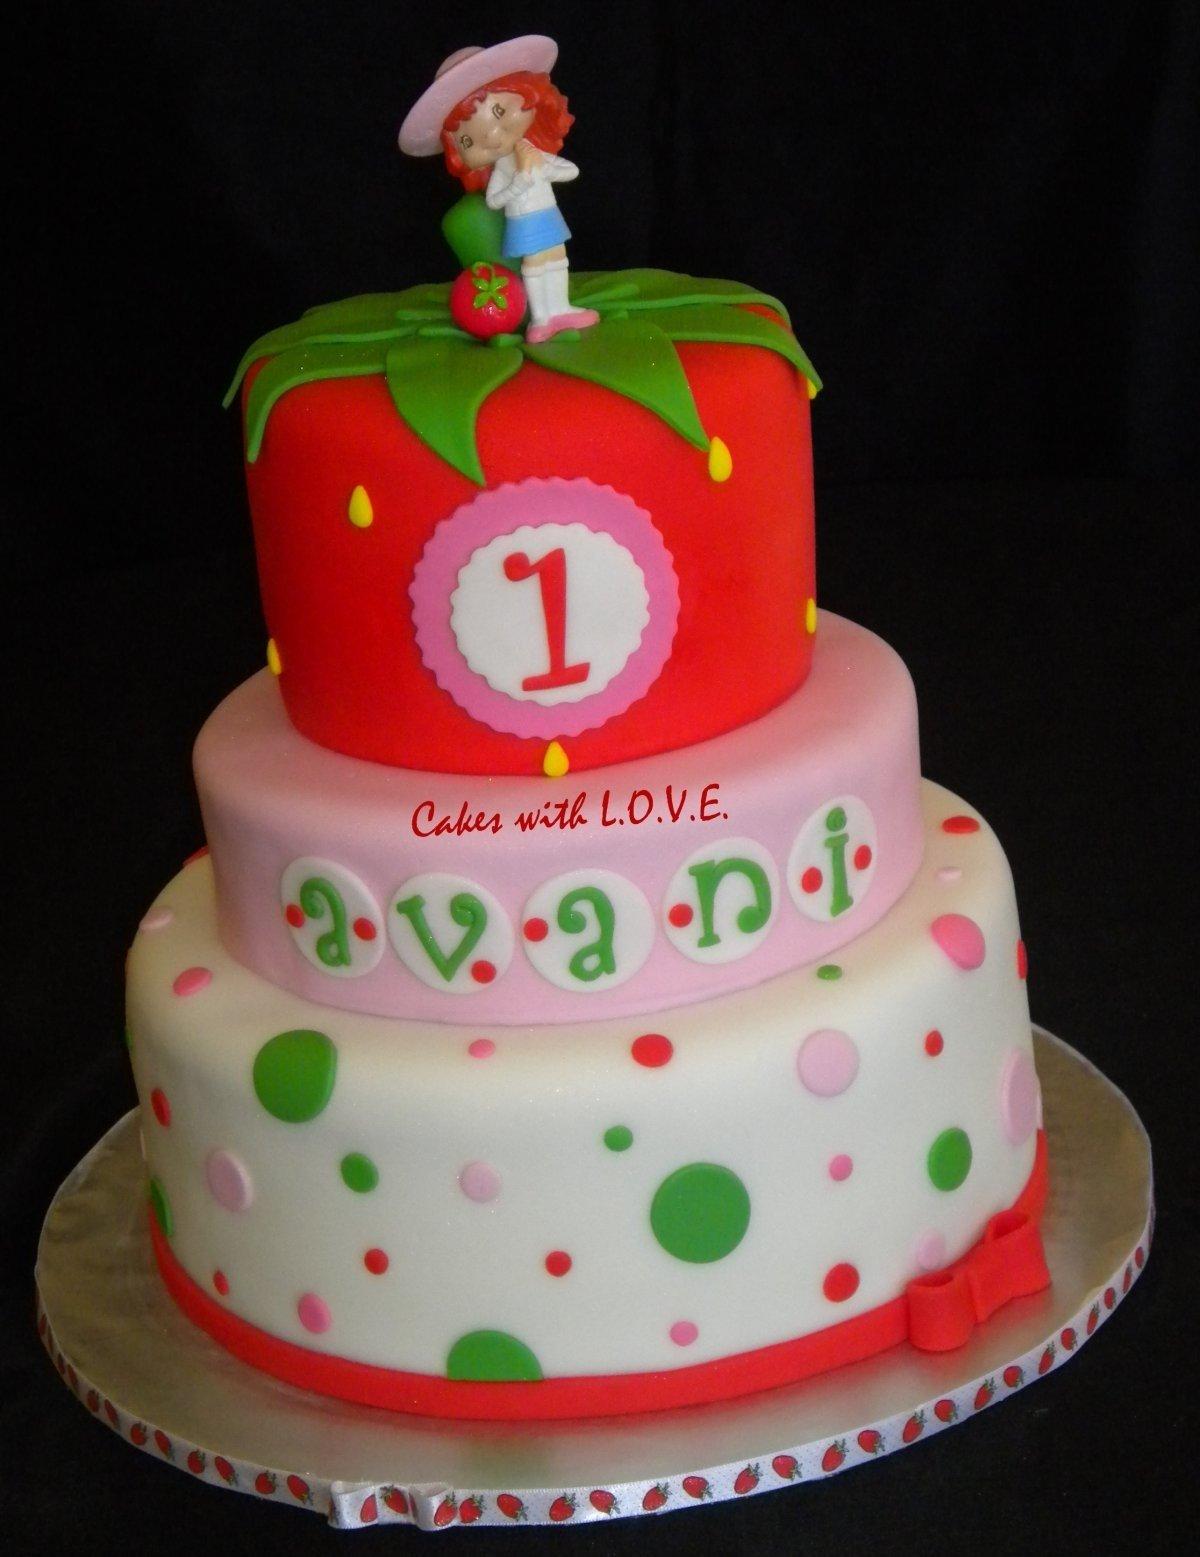 10 Attractive Strawberry Shortcake Birthday Cake Ideas strawberry shortcake sophias middle name avani strawberry 2020